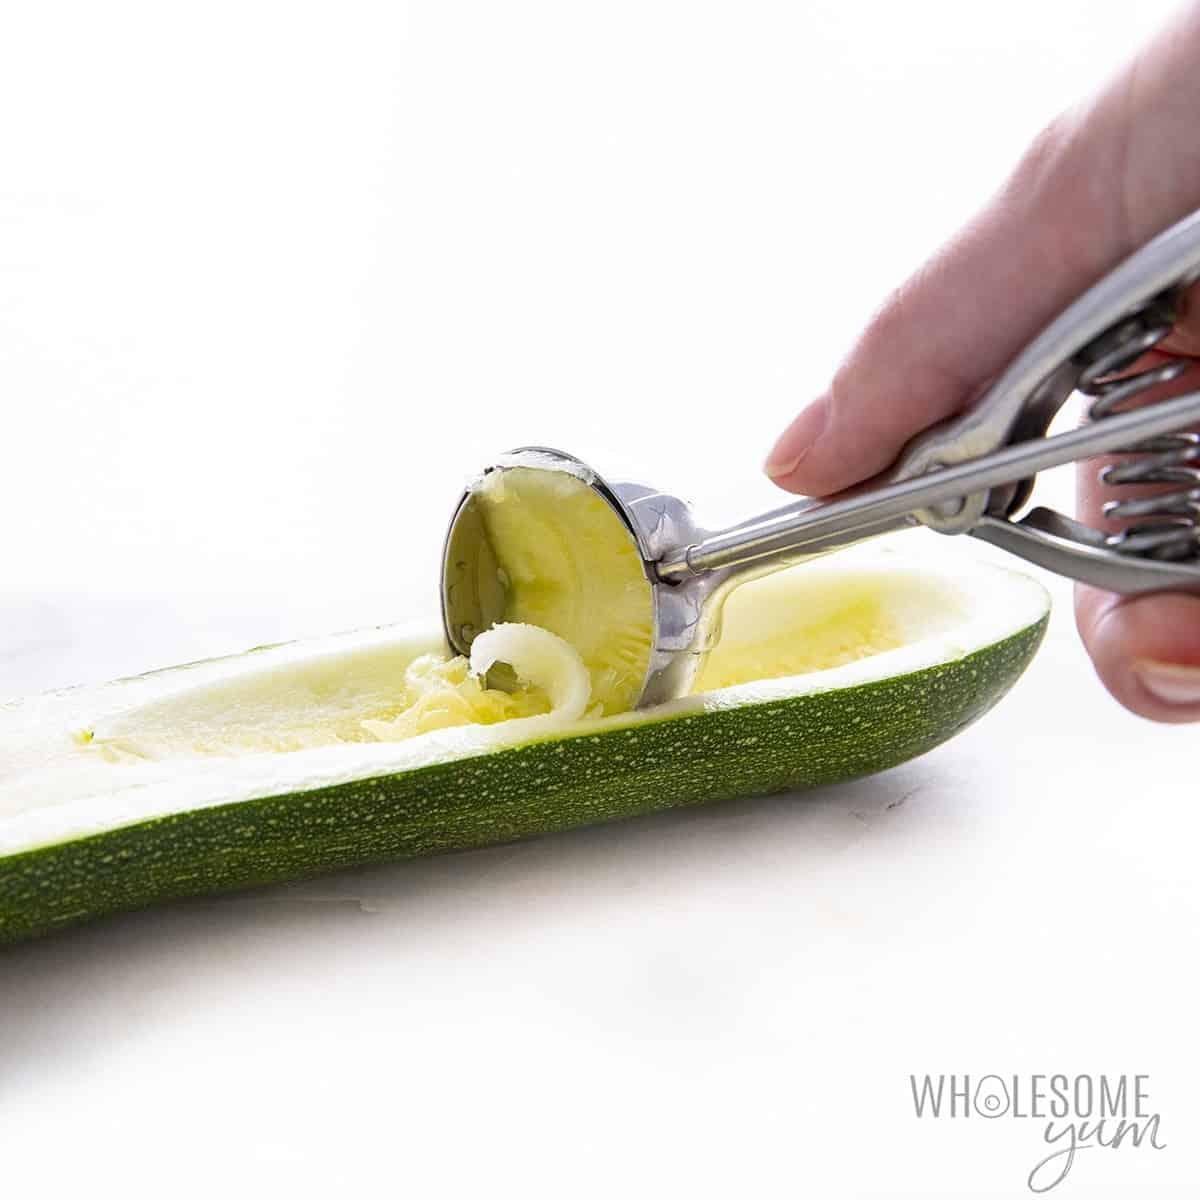 Prepping zucchini for zucchini boat